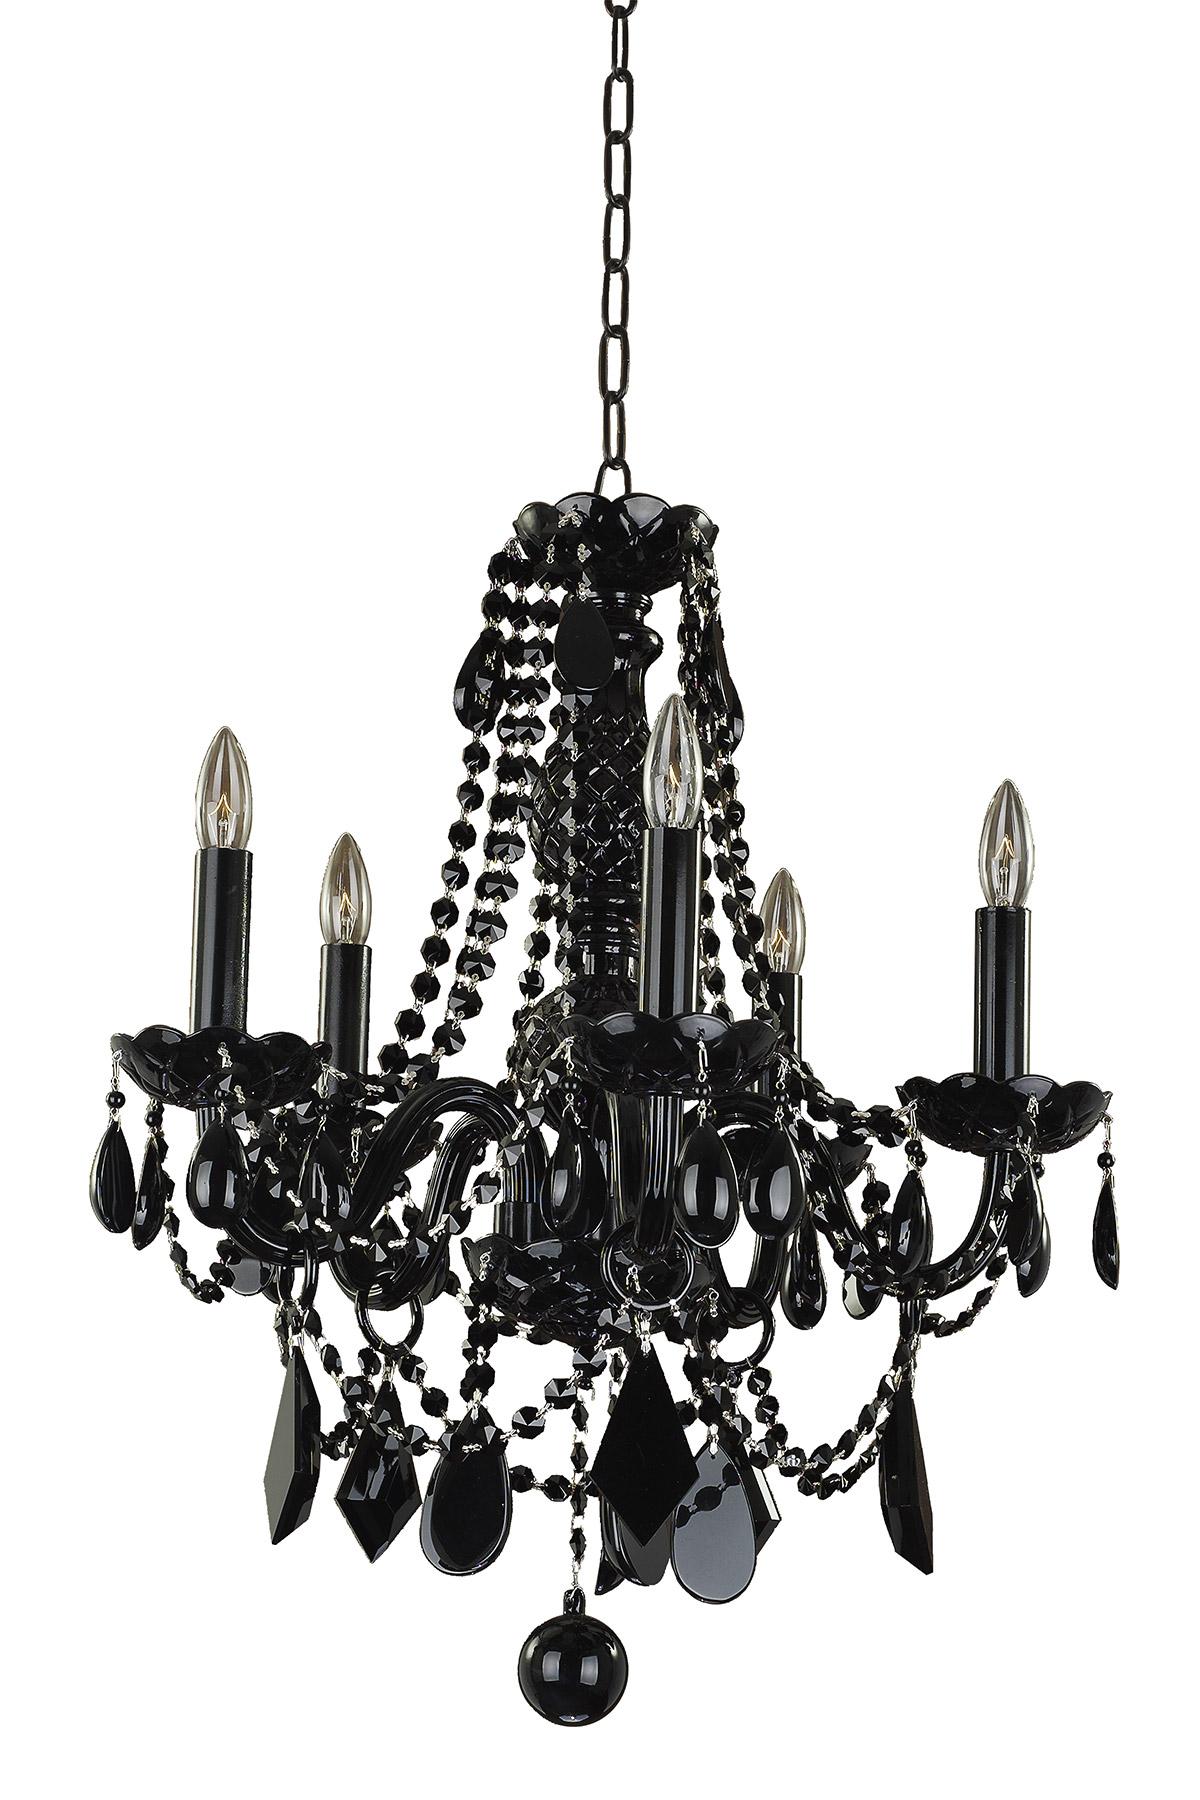 Black Tie 5 Light Chandelier By Glow Lighting